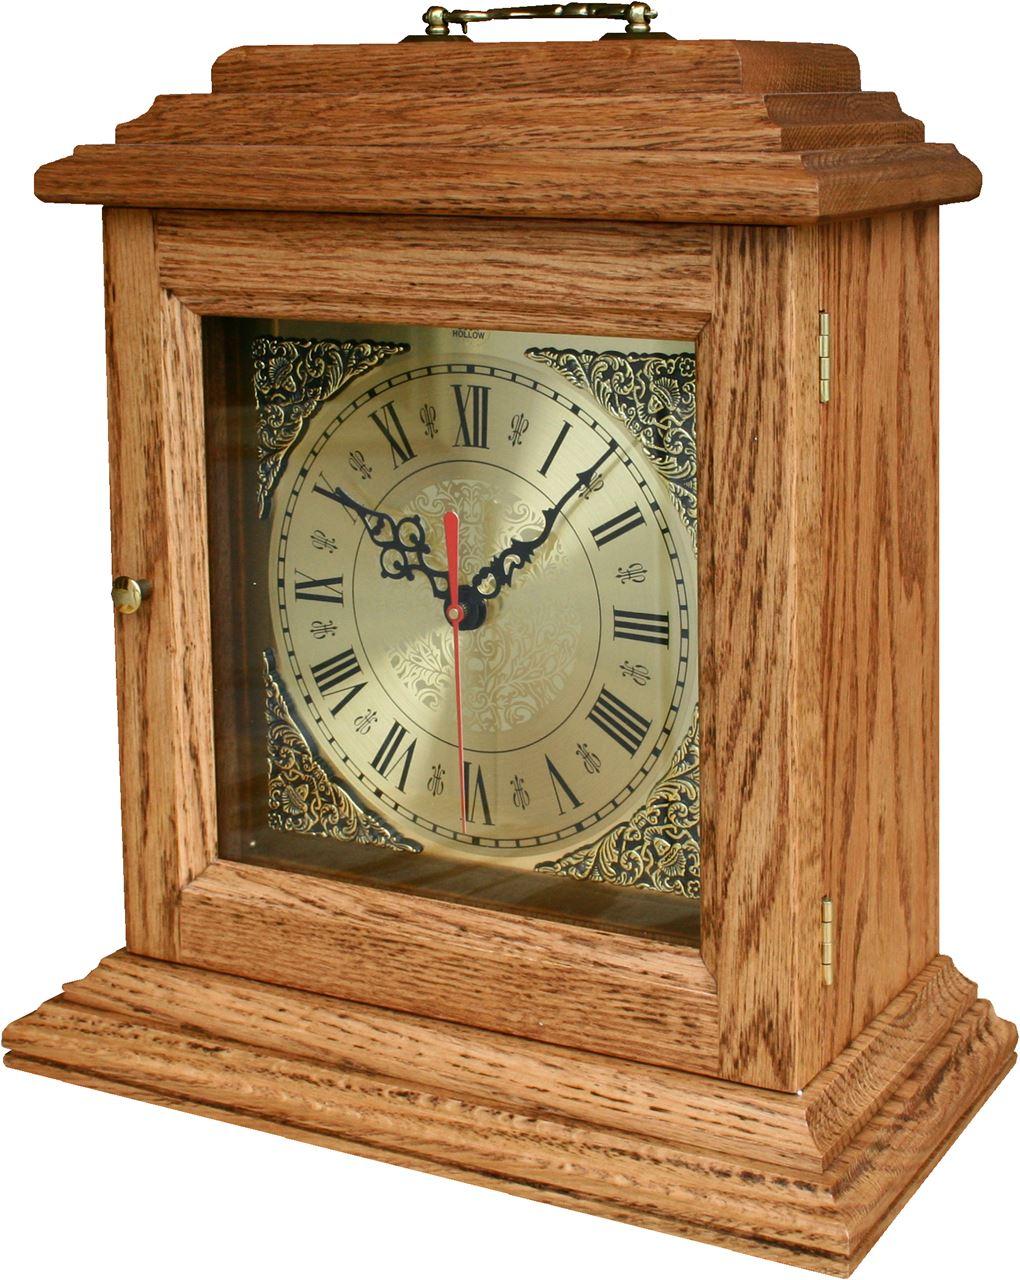 Antique Shelf Clock Four Seasons Furnishings Handmade